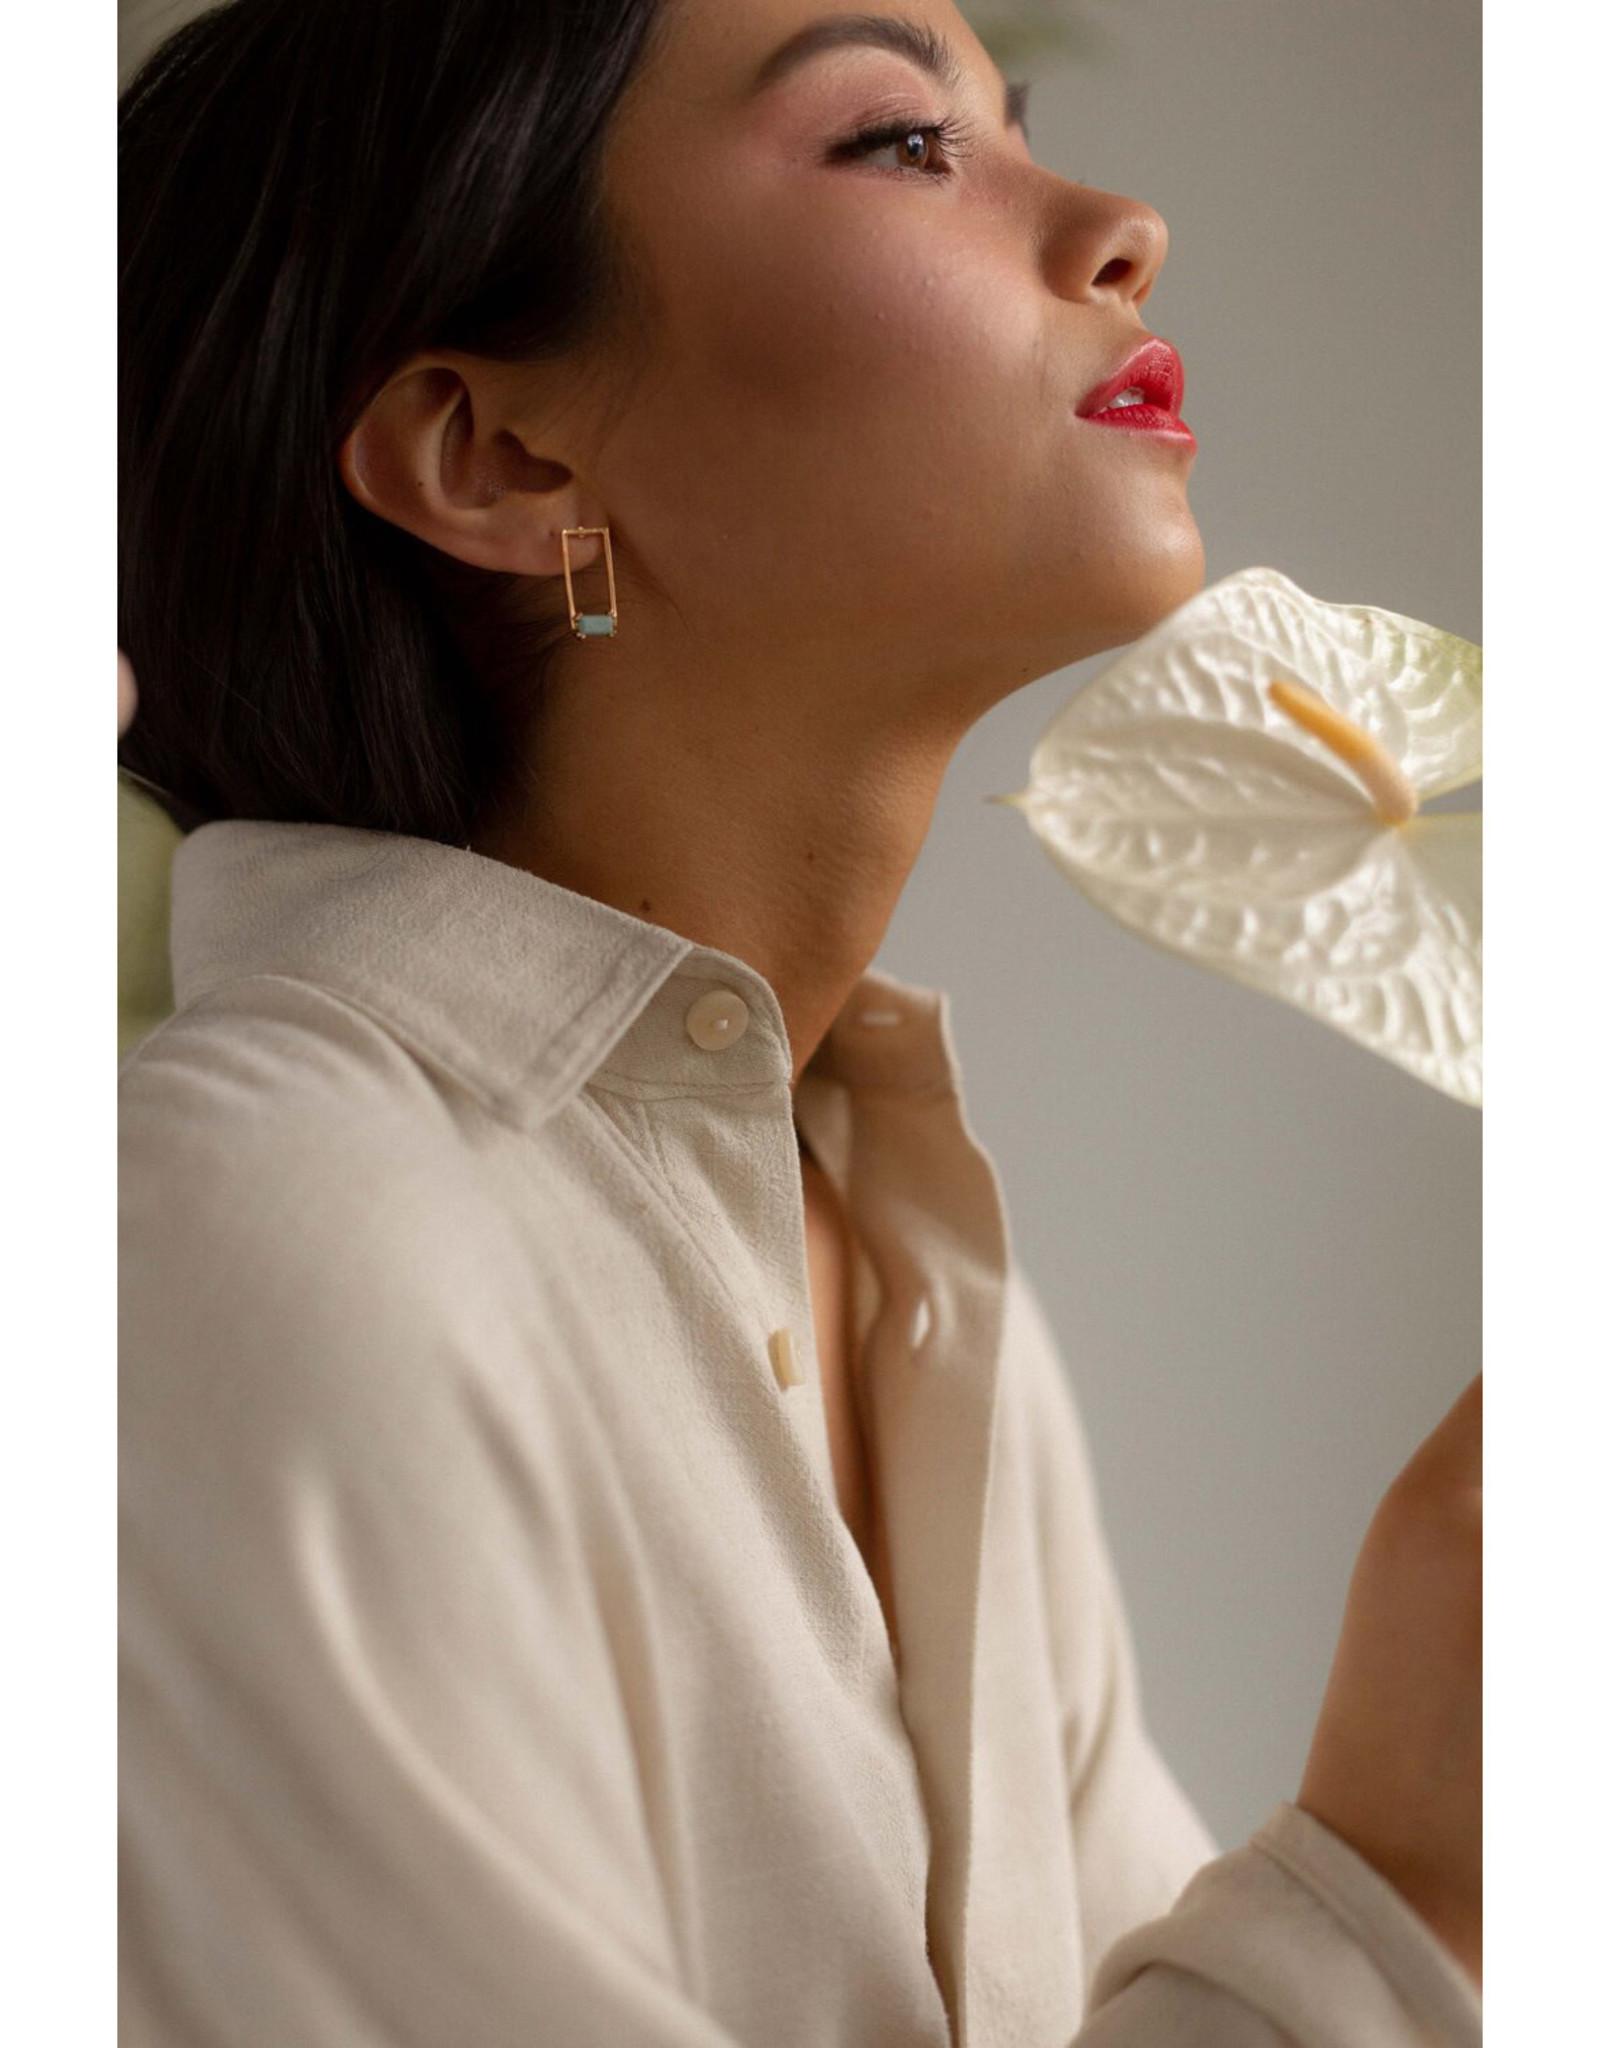 Hailey Gerrits Designs Corsica Earrings - Green Turquoise